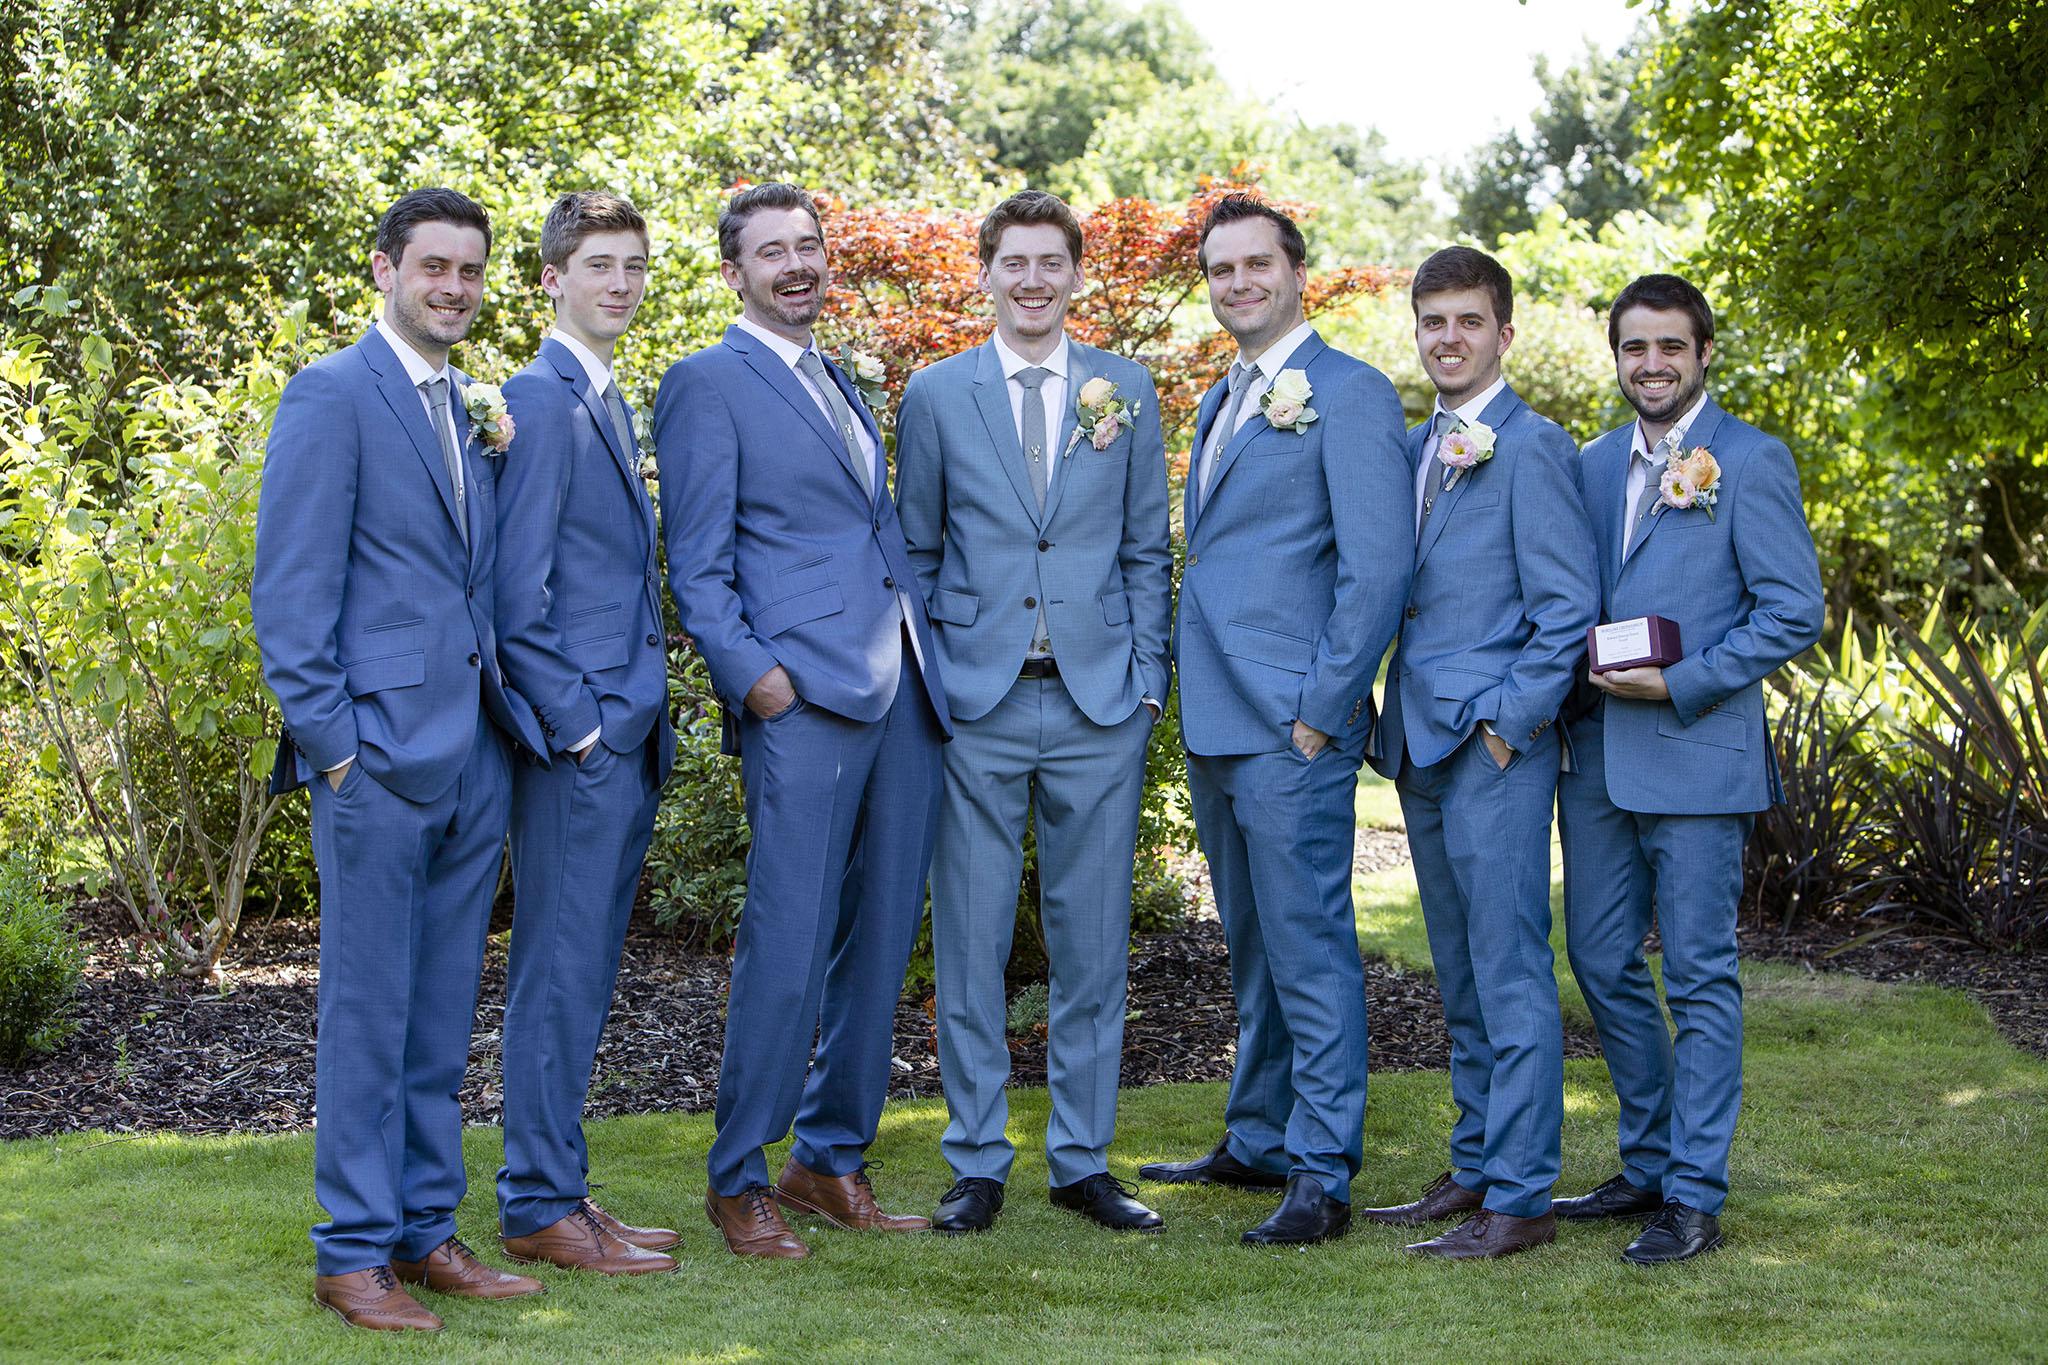 elizabethgphotography_kingslangley_hertfordshire_fineart_wedding_pottersbar_matt_katie_pegg_28.jpg